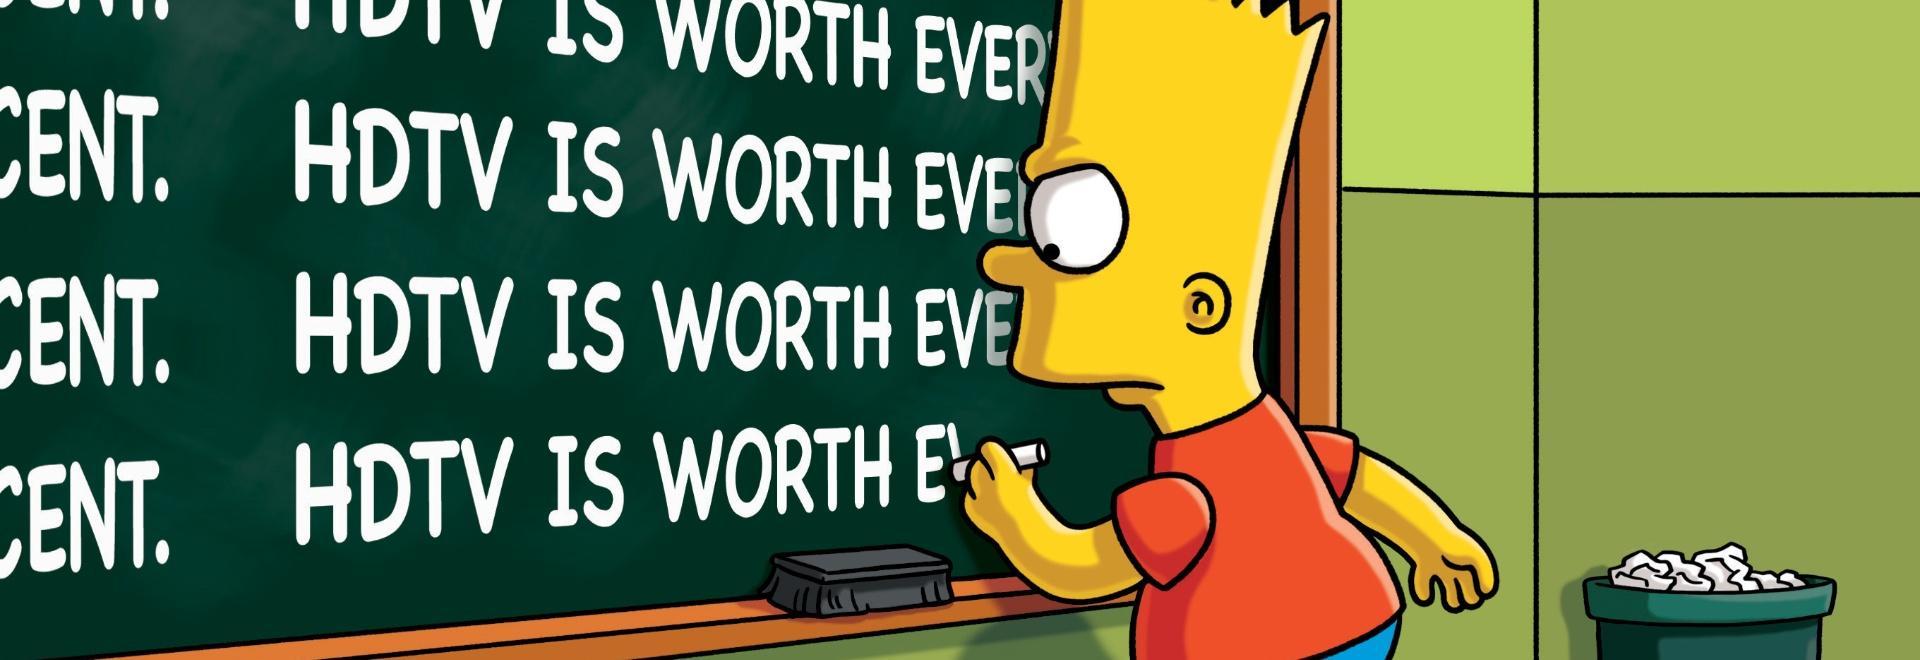 Dai e ridai, Bart, quanti danni fai!